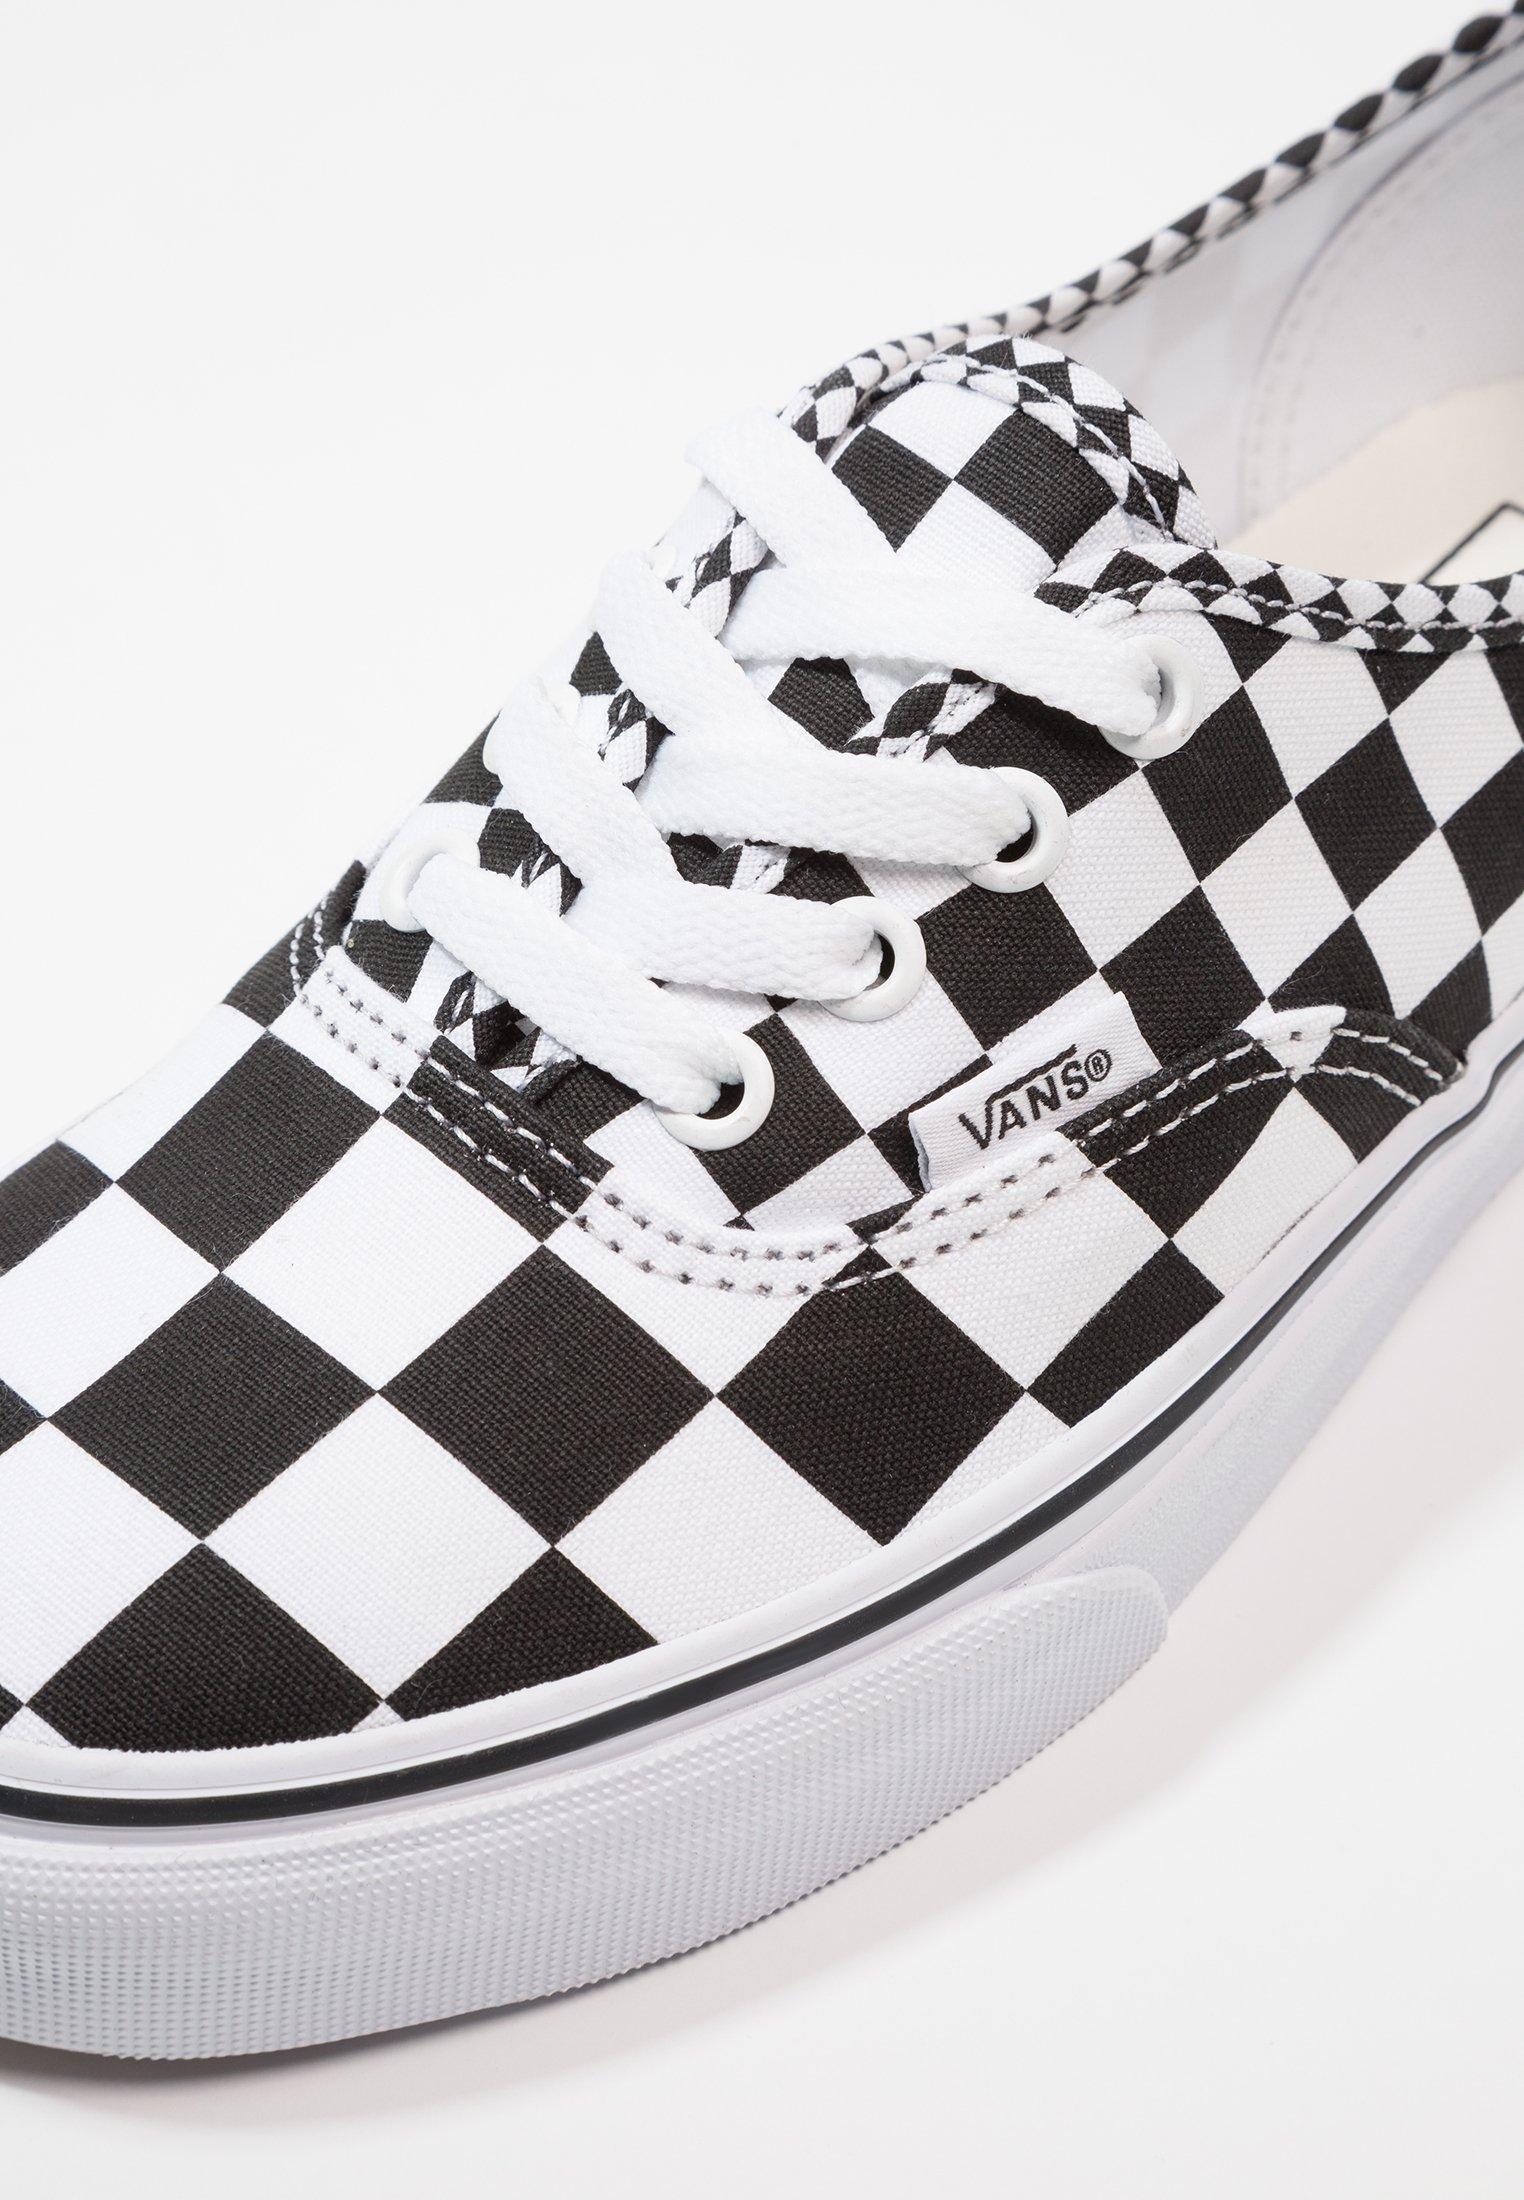 Vans Authentic Trainers - B&W Checkerboard @ Zalando - £20